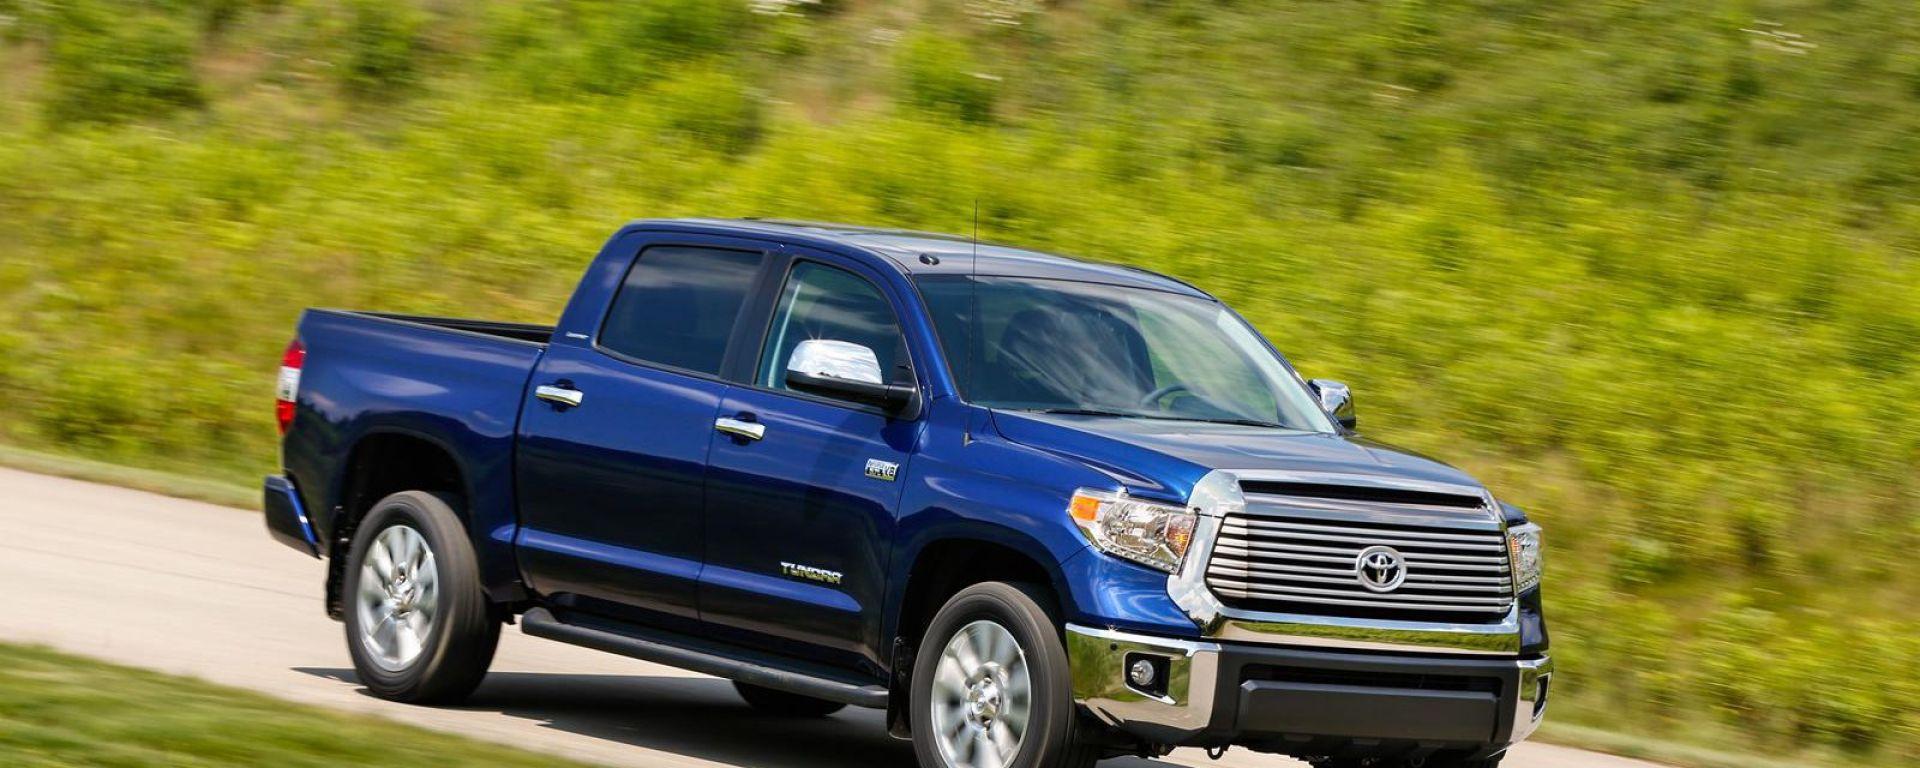 Toyota Tundra Diesel Hybrid